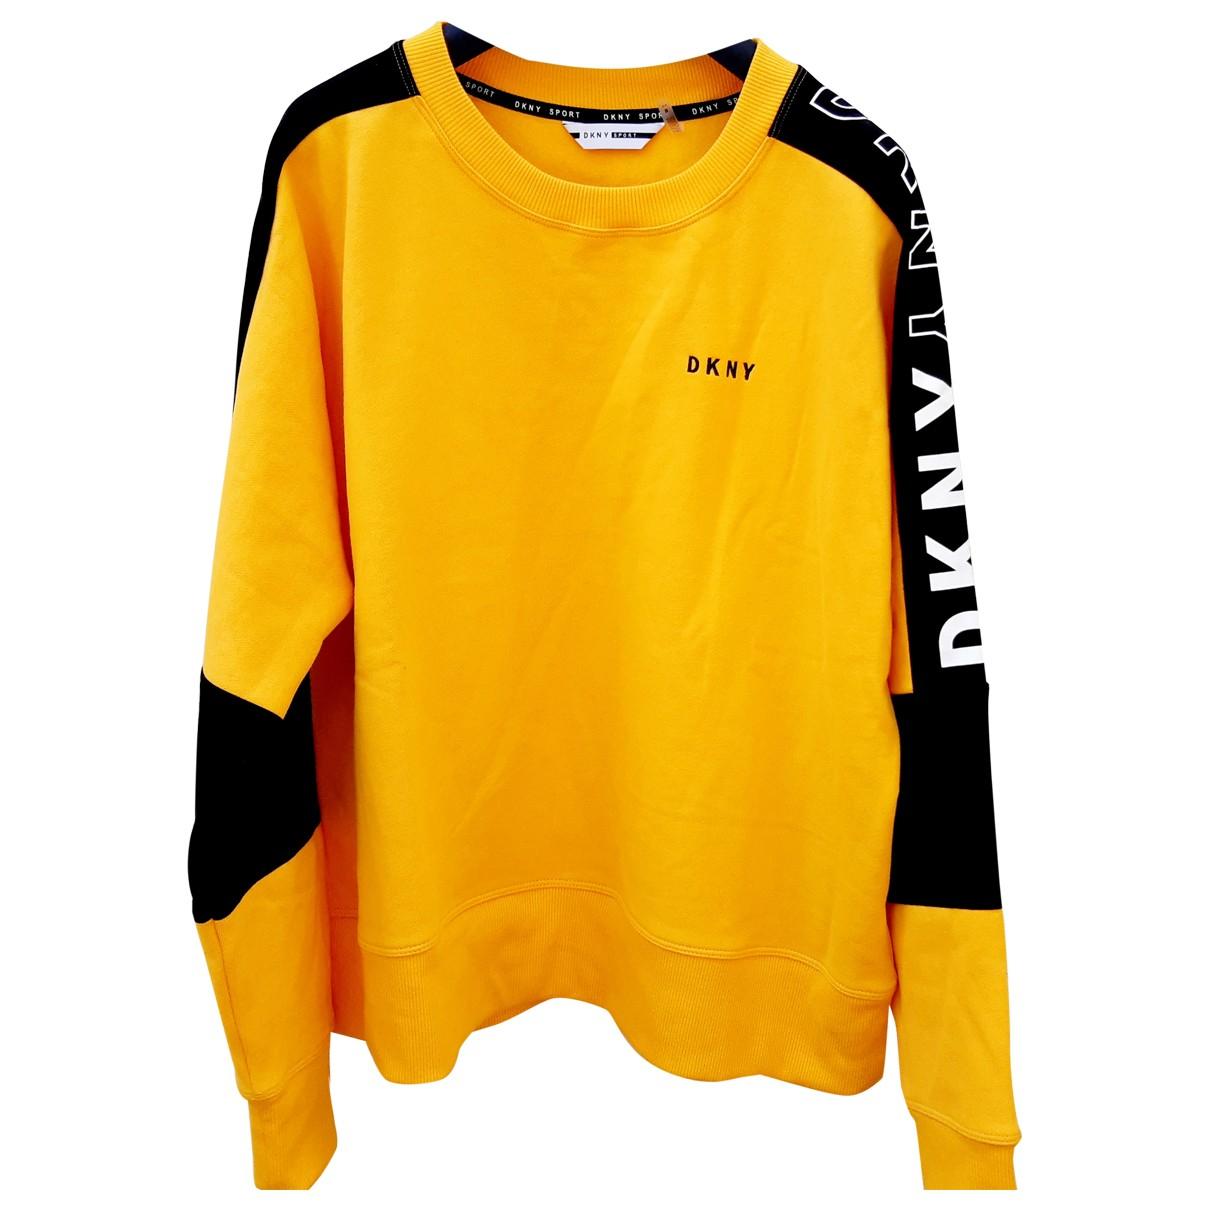 Dkny \N Yellow Cotton  top for Women M International